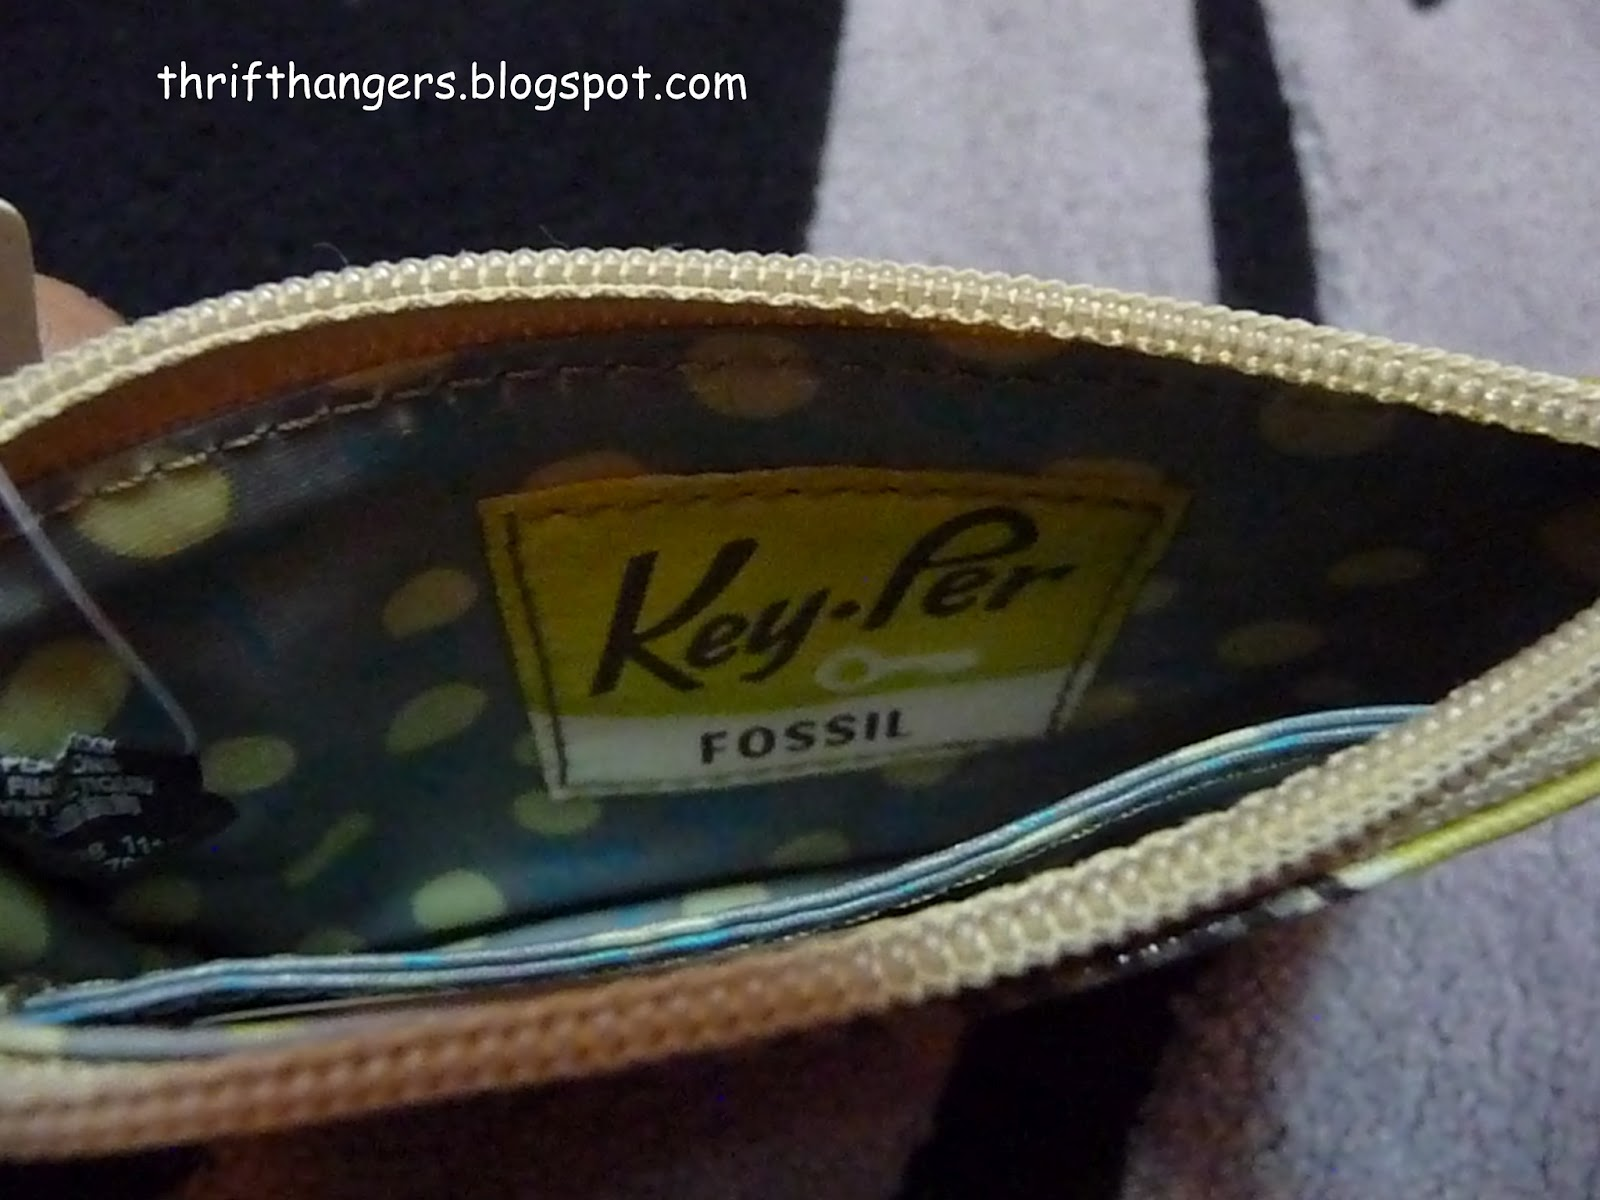 Bnwt Fossil Key Per Coin Purse Thrift Hangers Keyper Cross Body Calypso Brand New